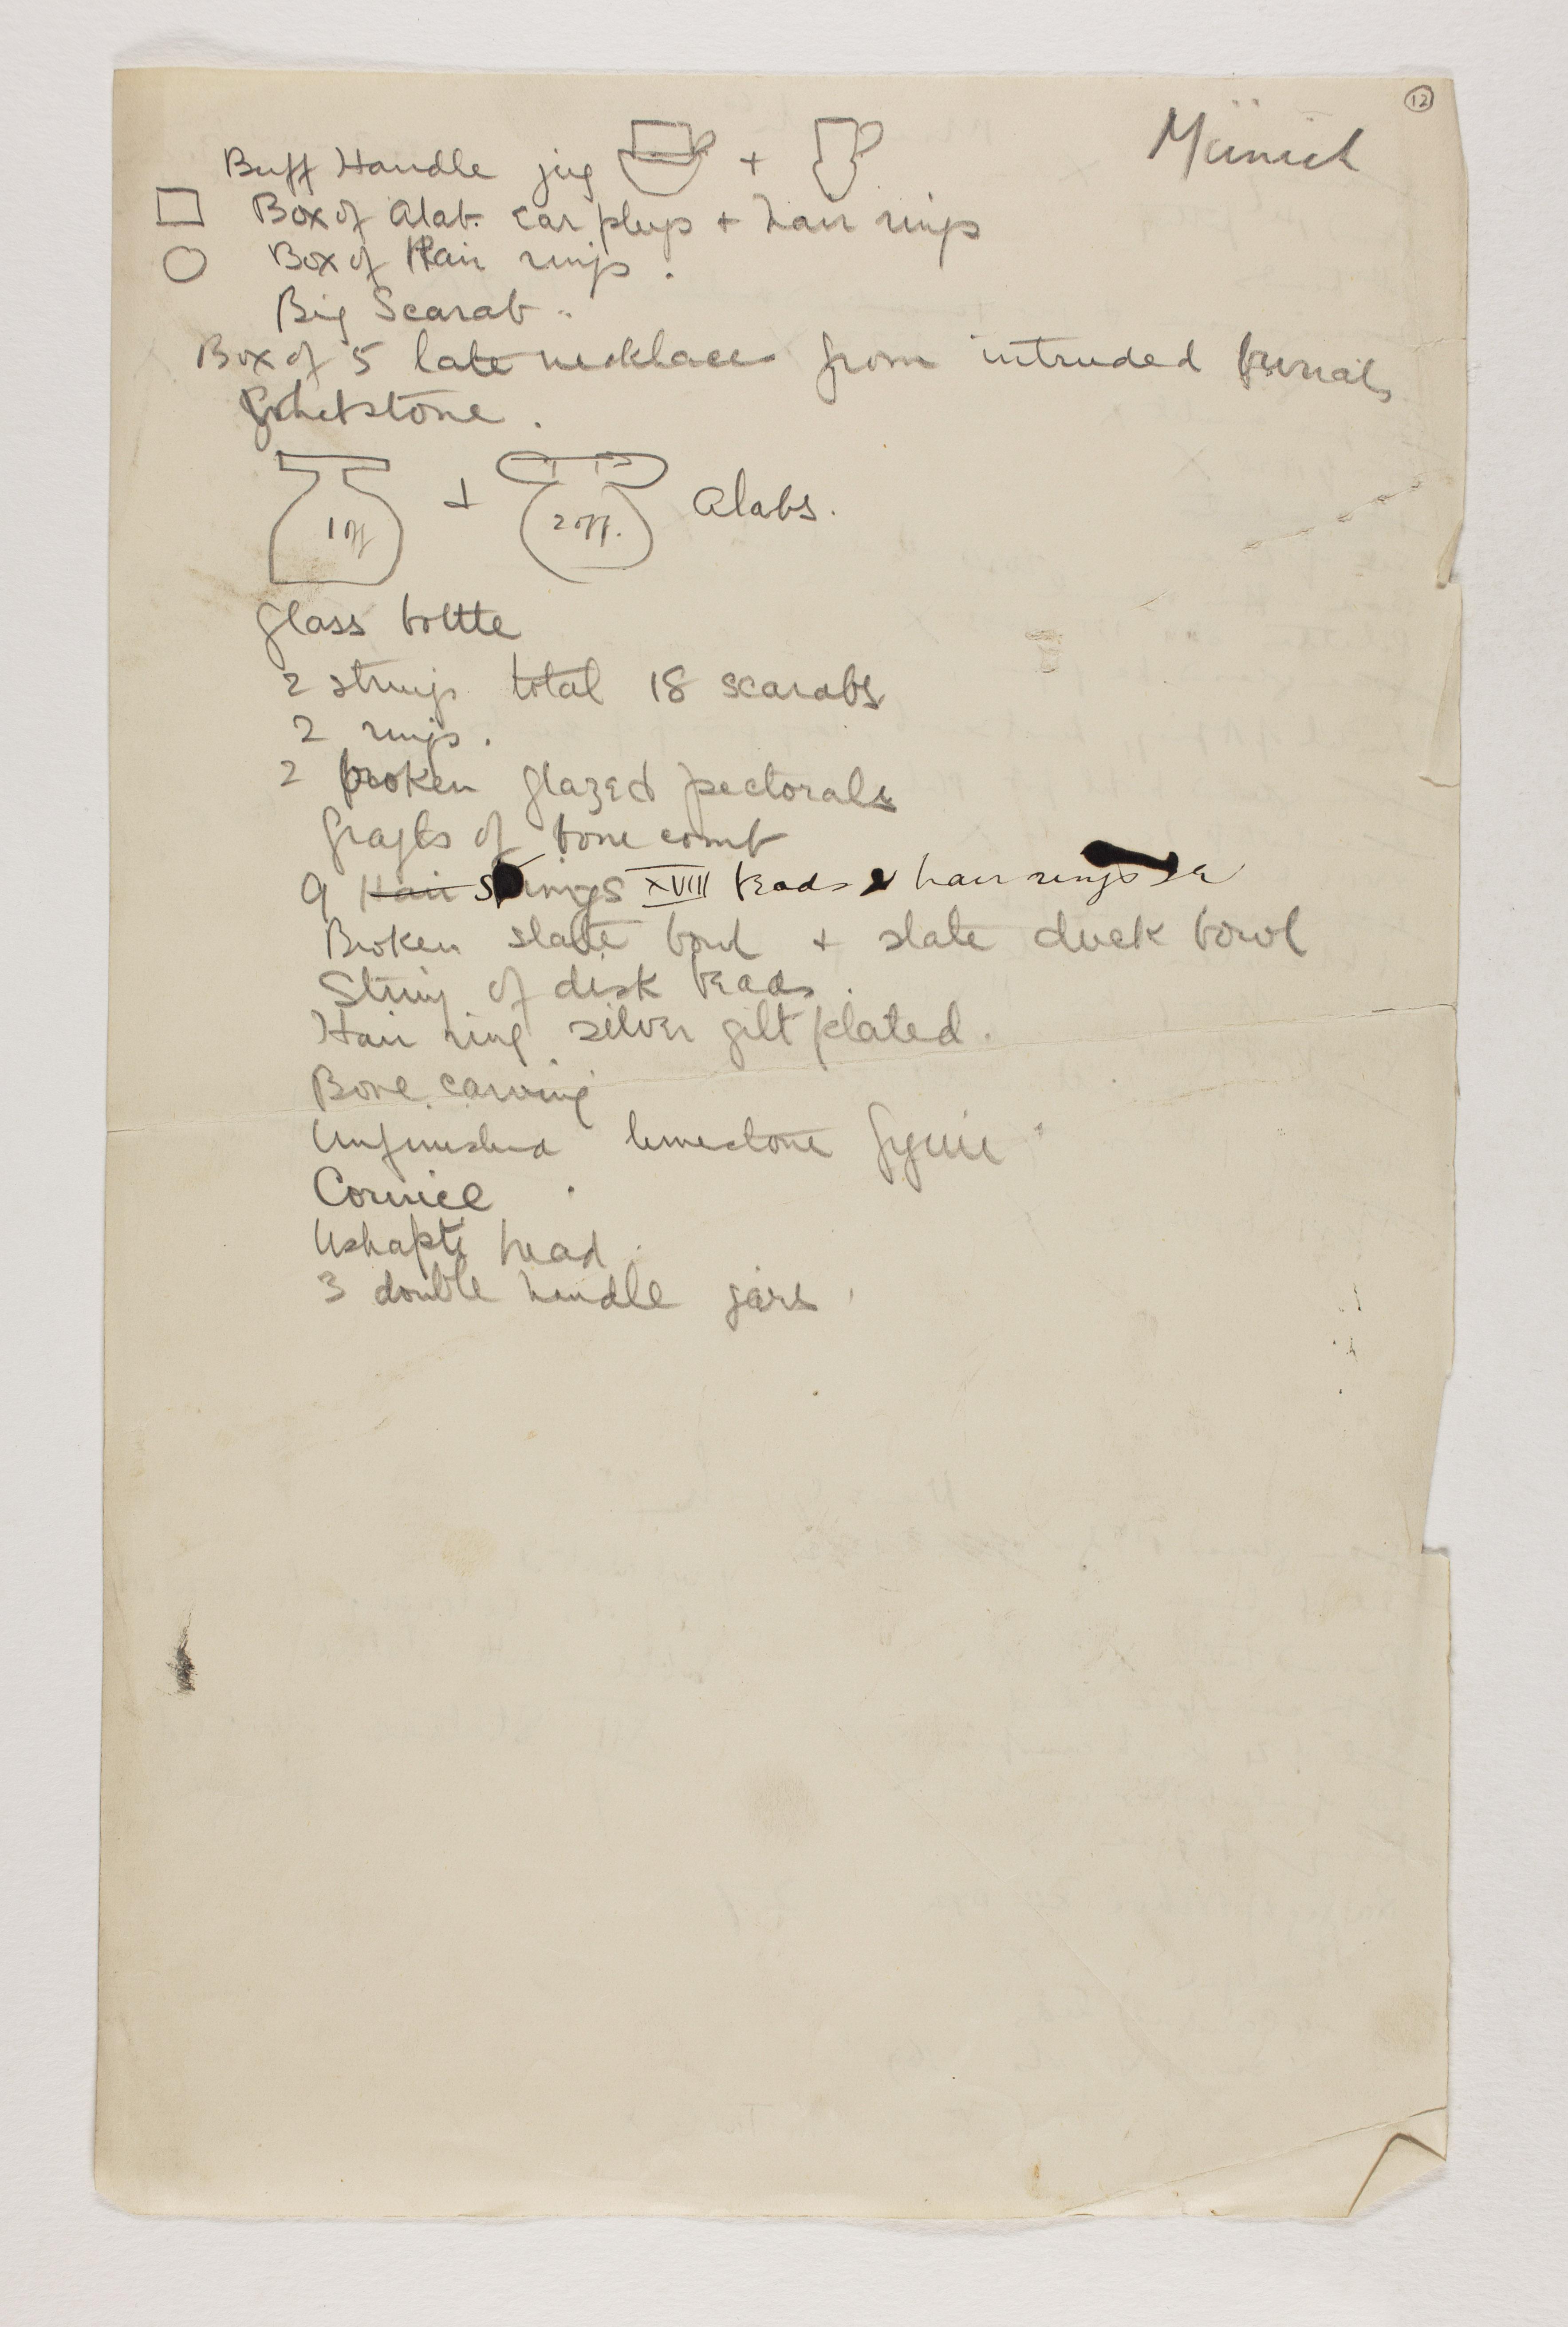 1912-13 Tarkhan, el-Riqqa, Memphis Individual institution list  PMA/WFP1/D/21/12.2